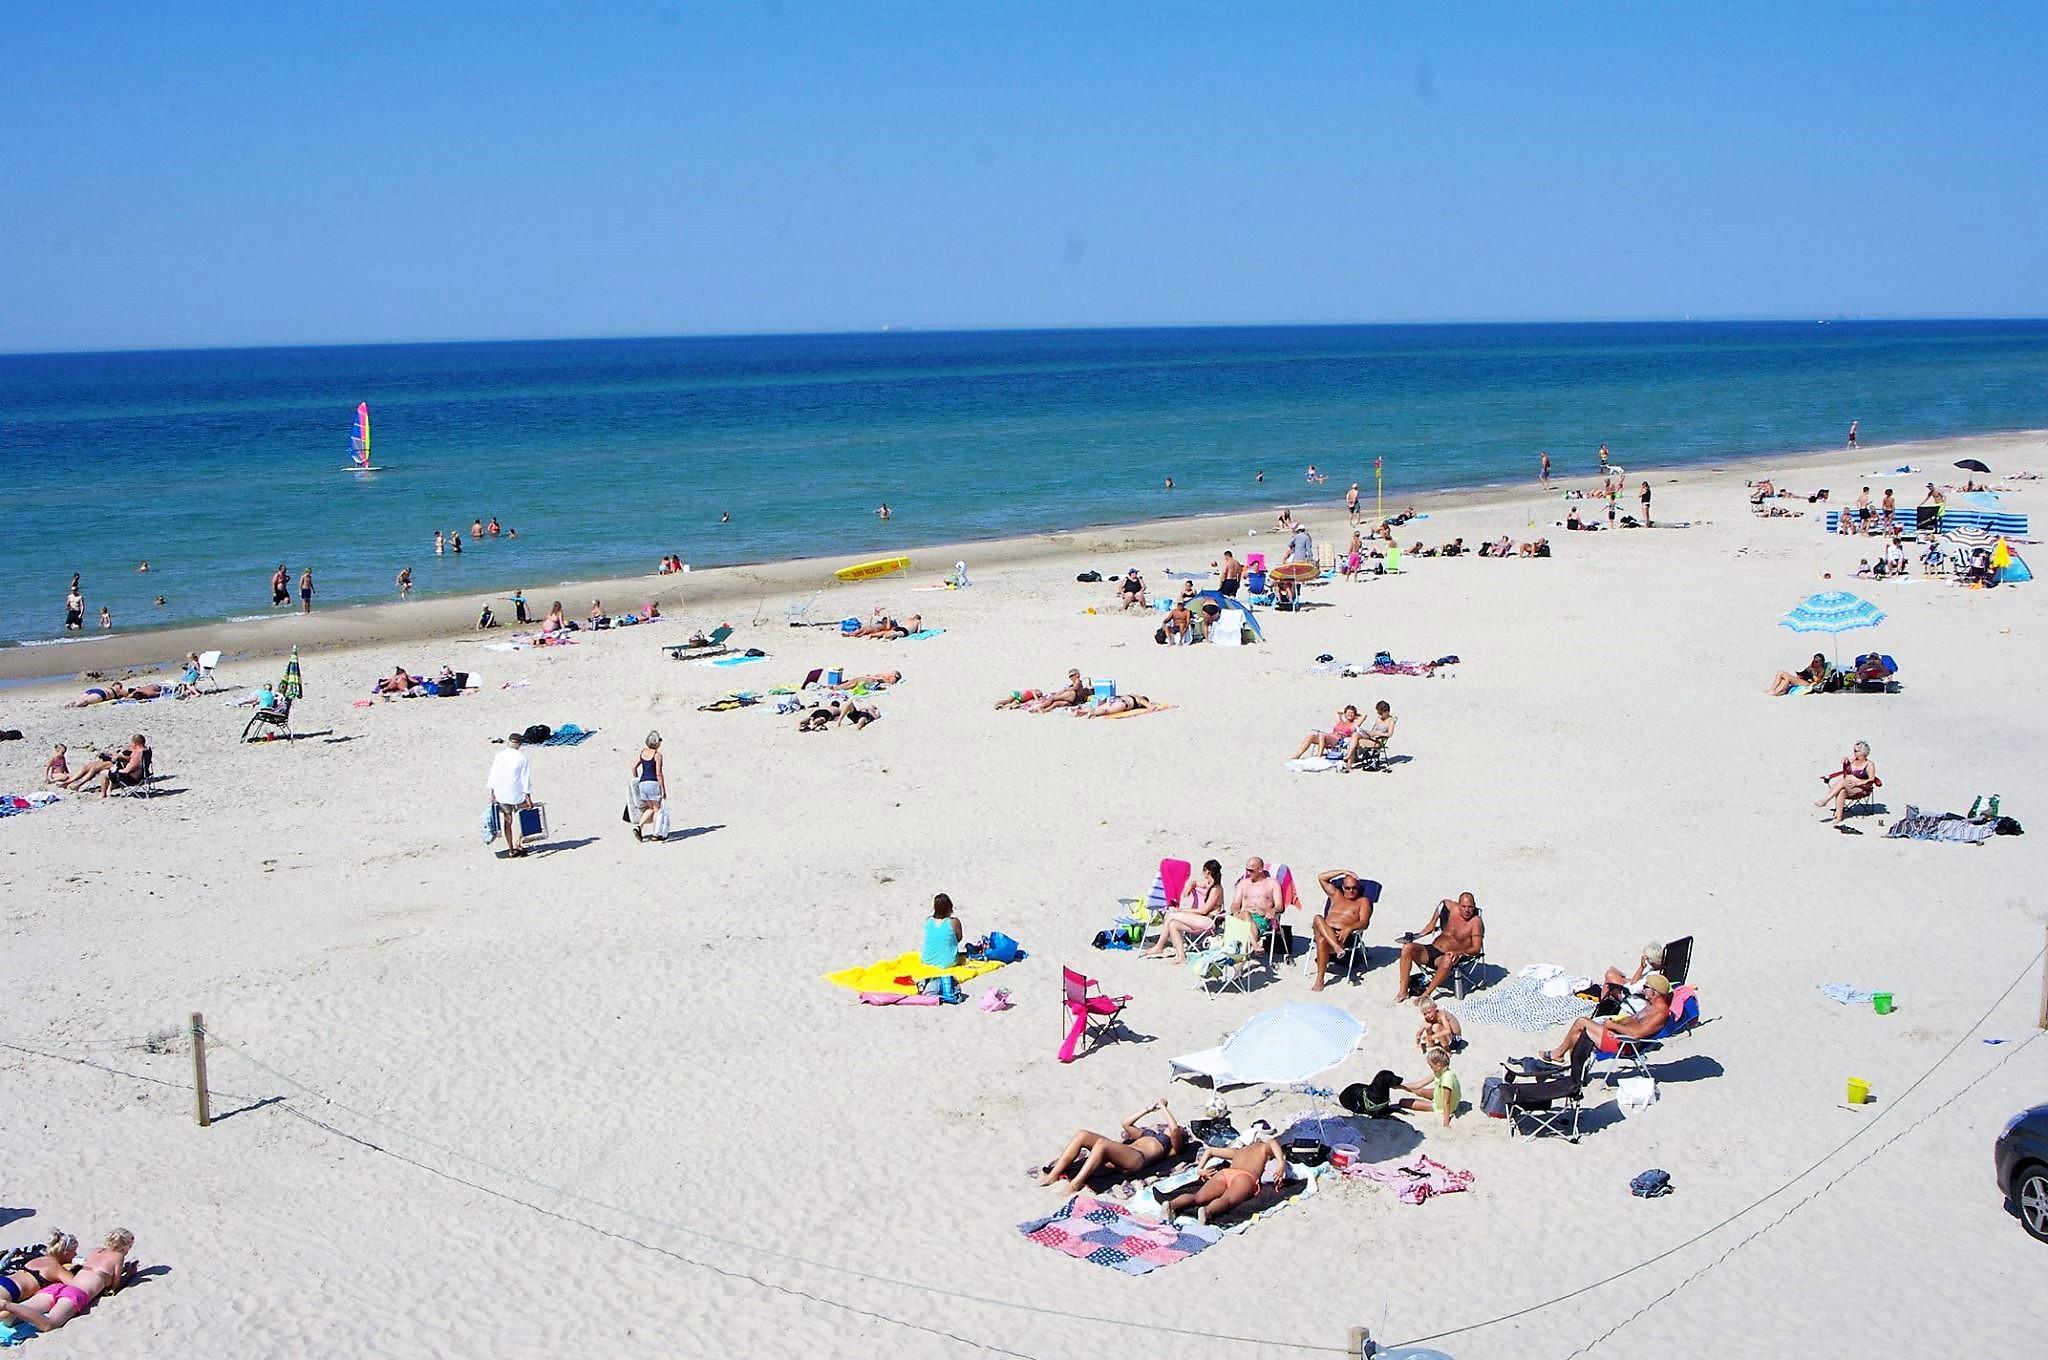 Tornby Strand Camping - ferie i Nordjylland (reklame)